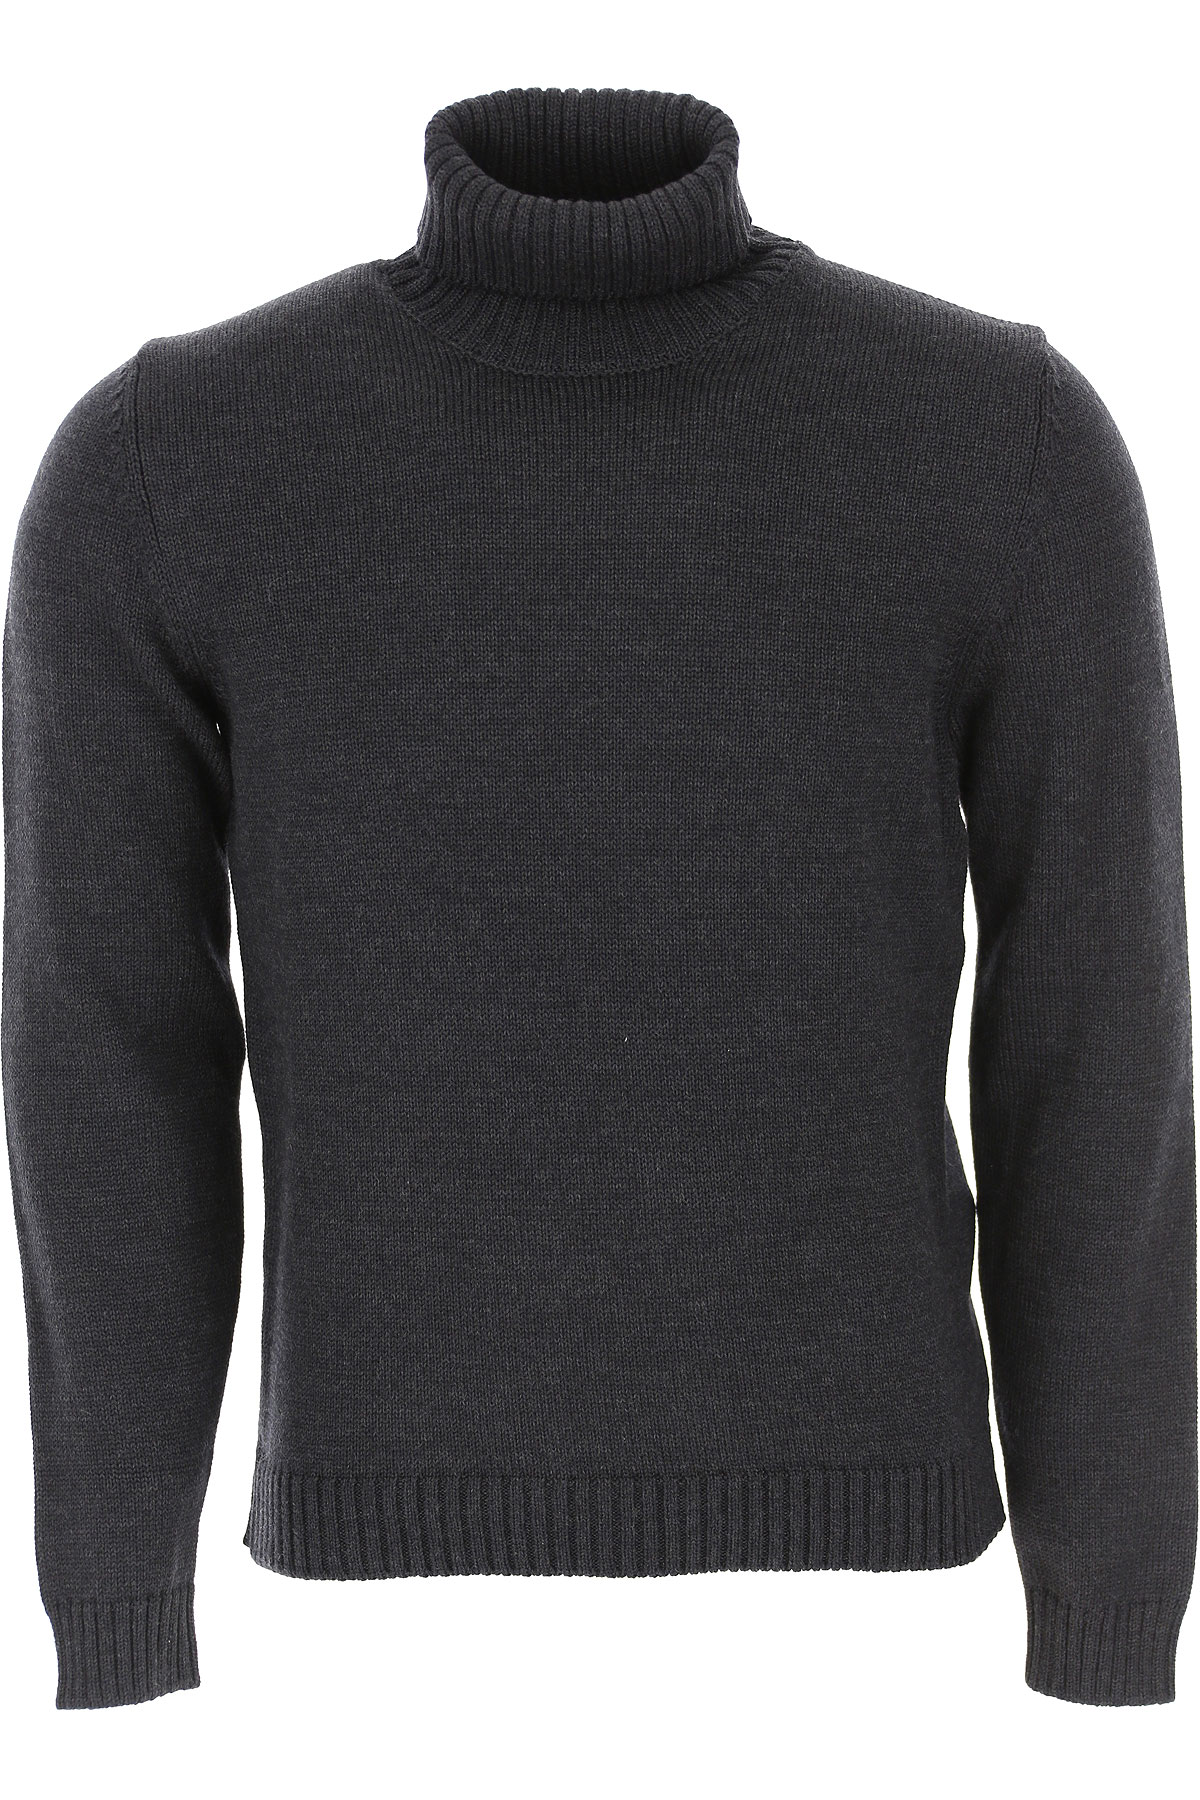 Zanone Sweater for Men Jumper On Sale, Anthracite Grey, Virgin wool, 2019, L M XL